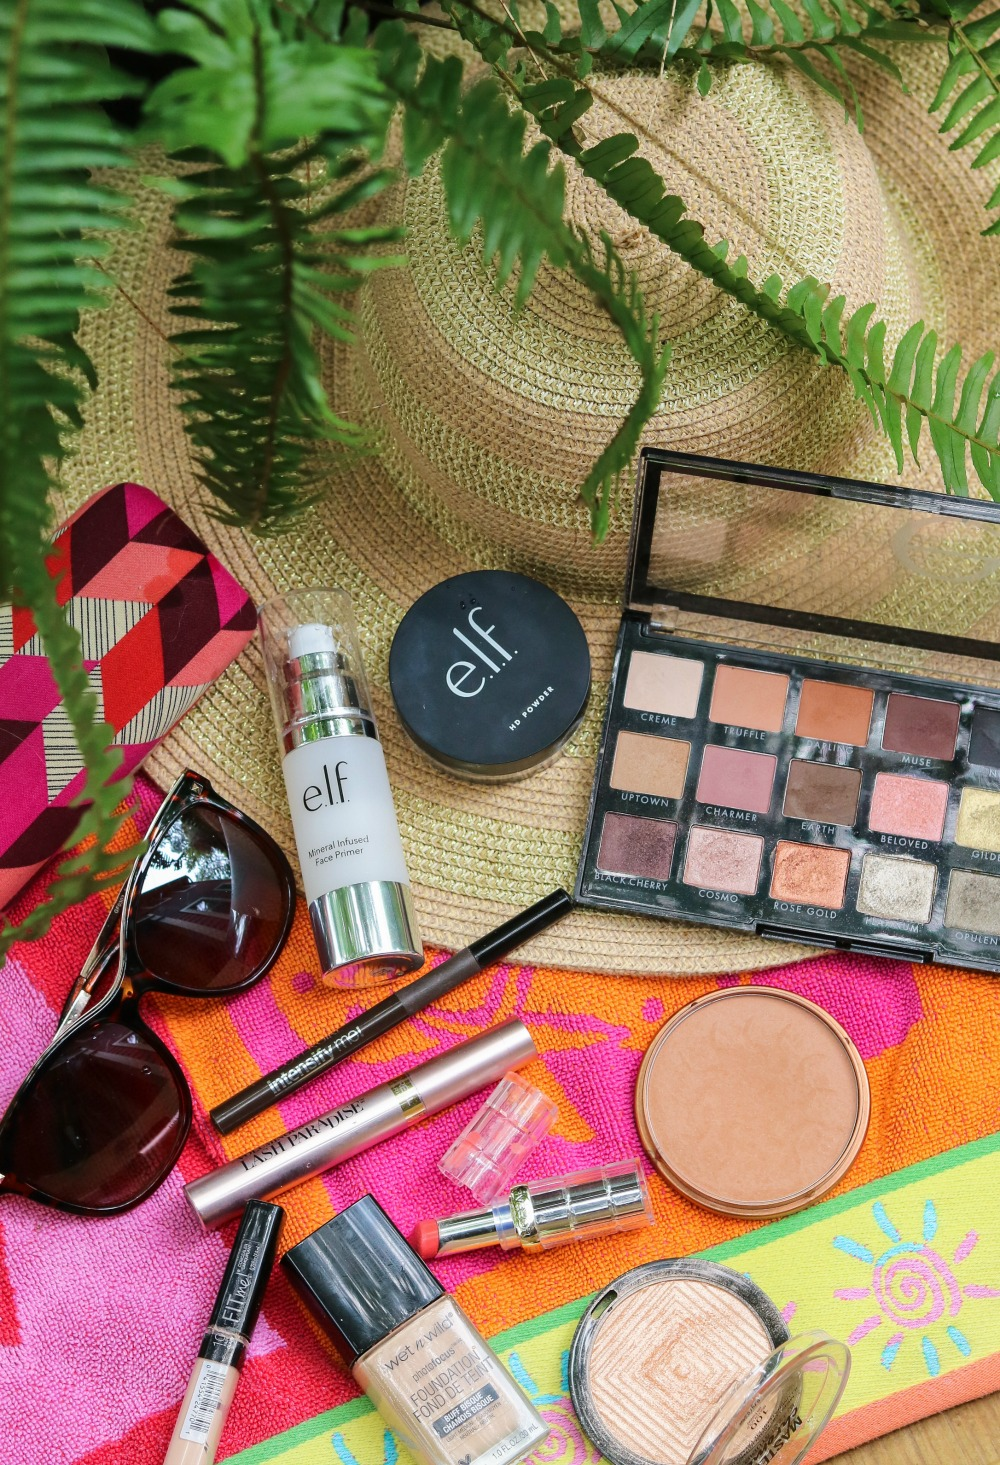 Summer Drugstore Makeup Tutorial I ELF Cosmetics, Loreal, Rimmel and Wet n Wild #summermakeup #makeuptutorial #beautyblogger #makeup